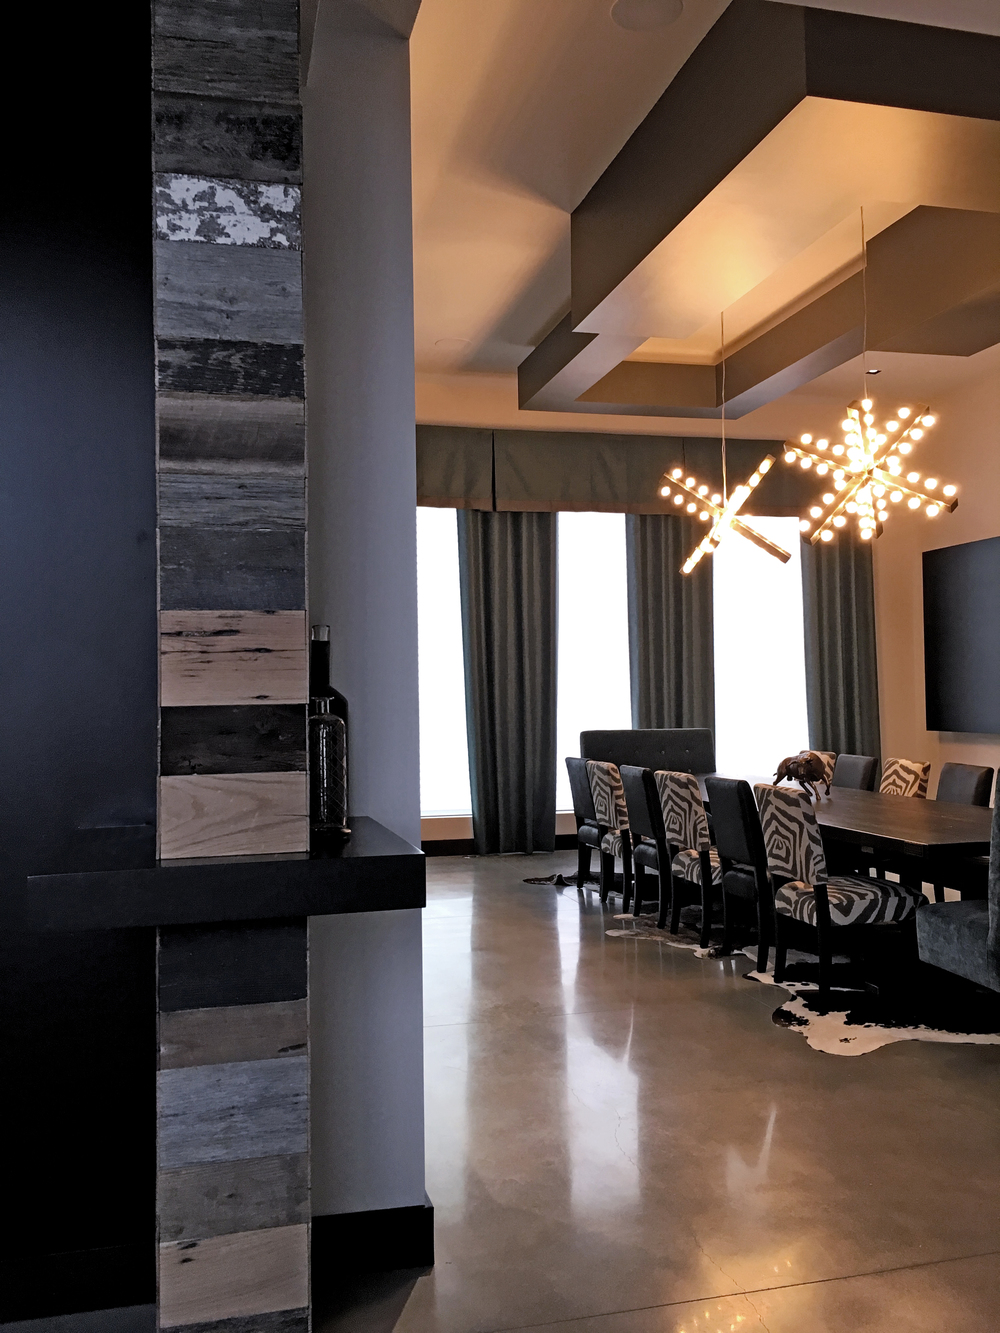 Dining room reclaimed wood pendant lights.jpg